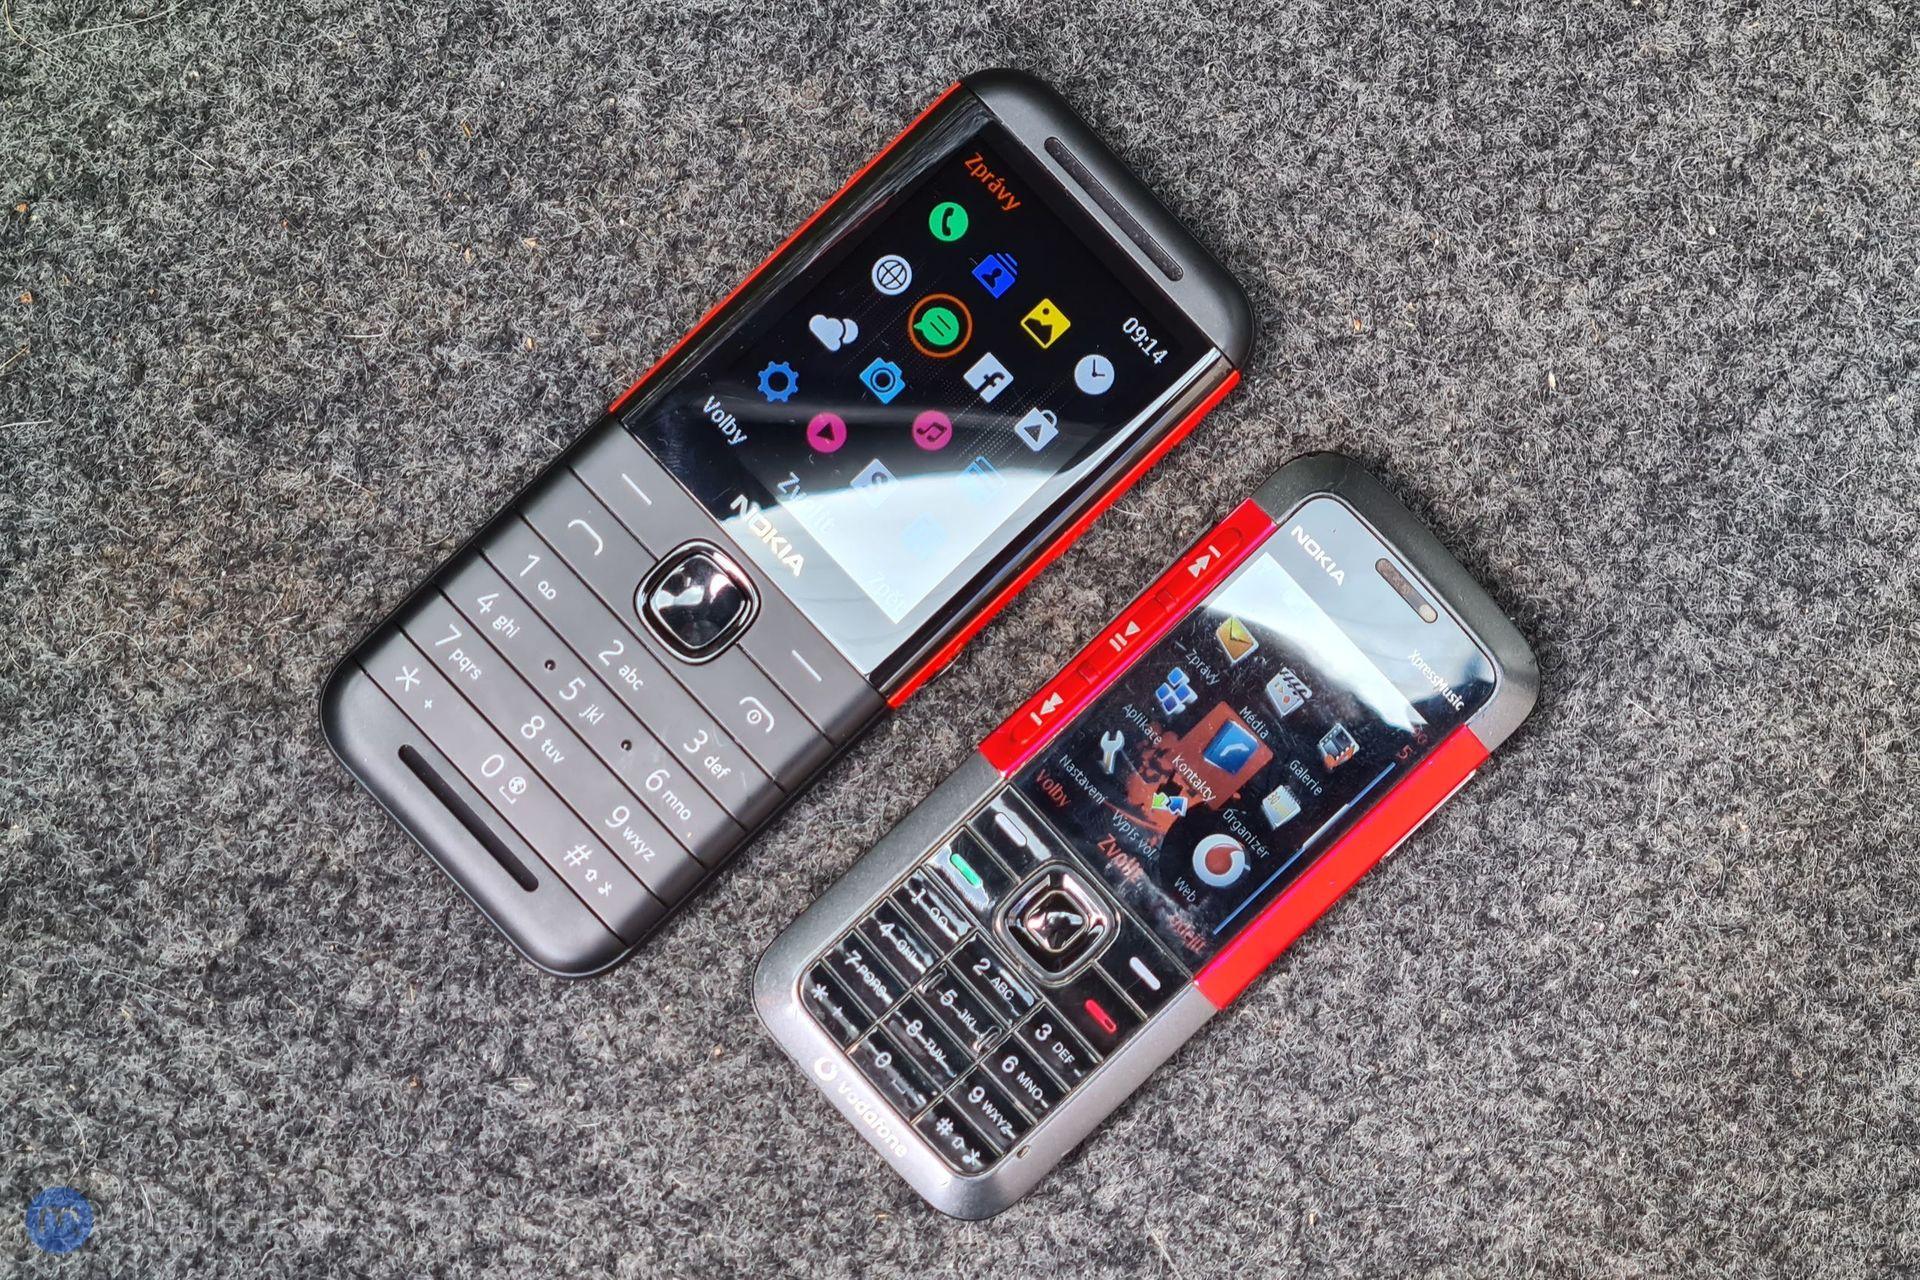 Nokia 5310 a Nokia 5310 XpressMusic